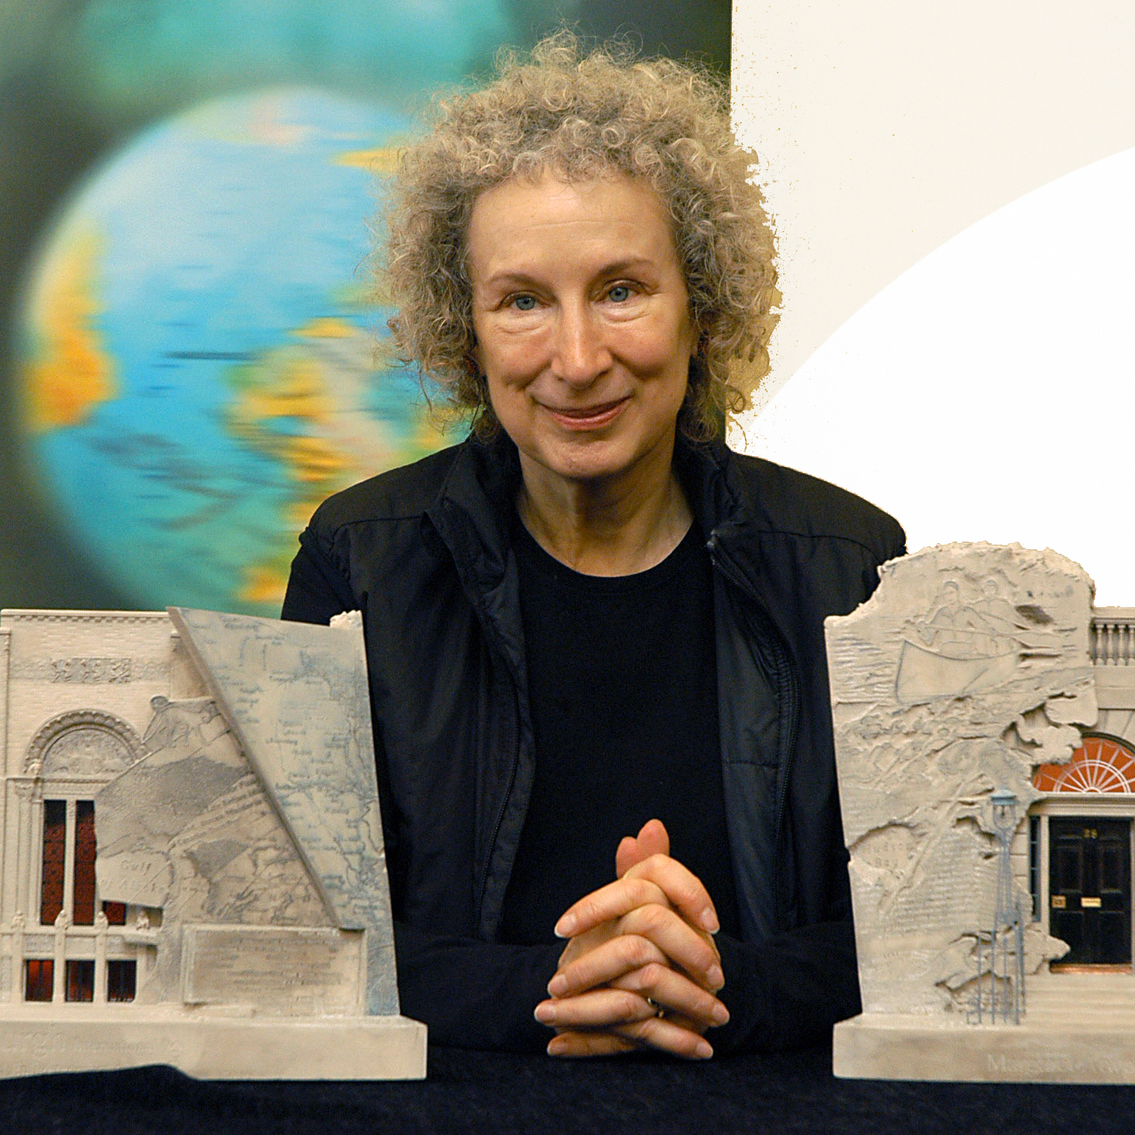 Margaret Atwood Enlightenment Award,  EDINBURGH BOOK PRIZE